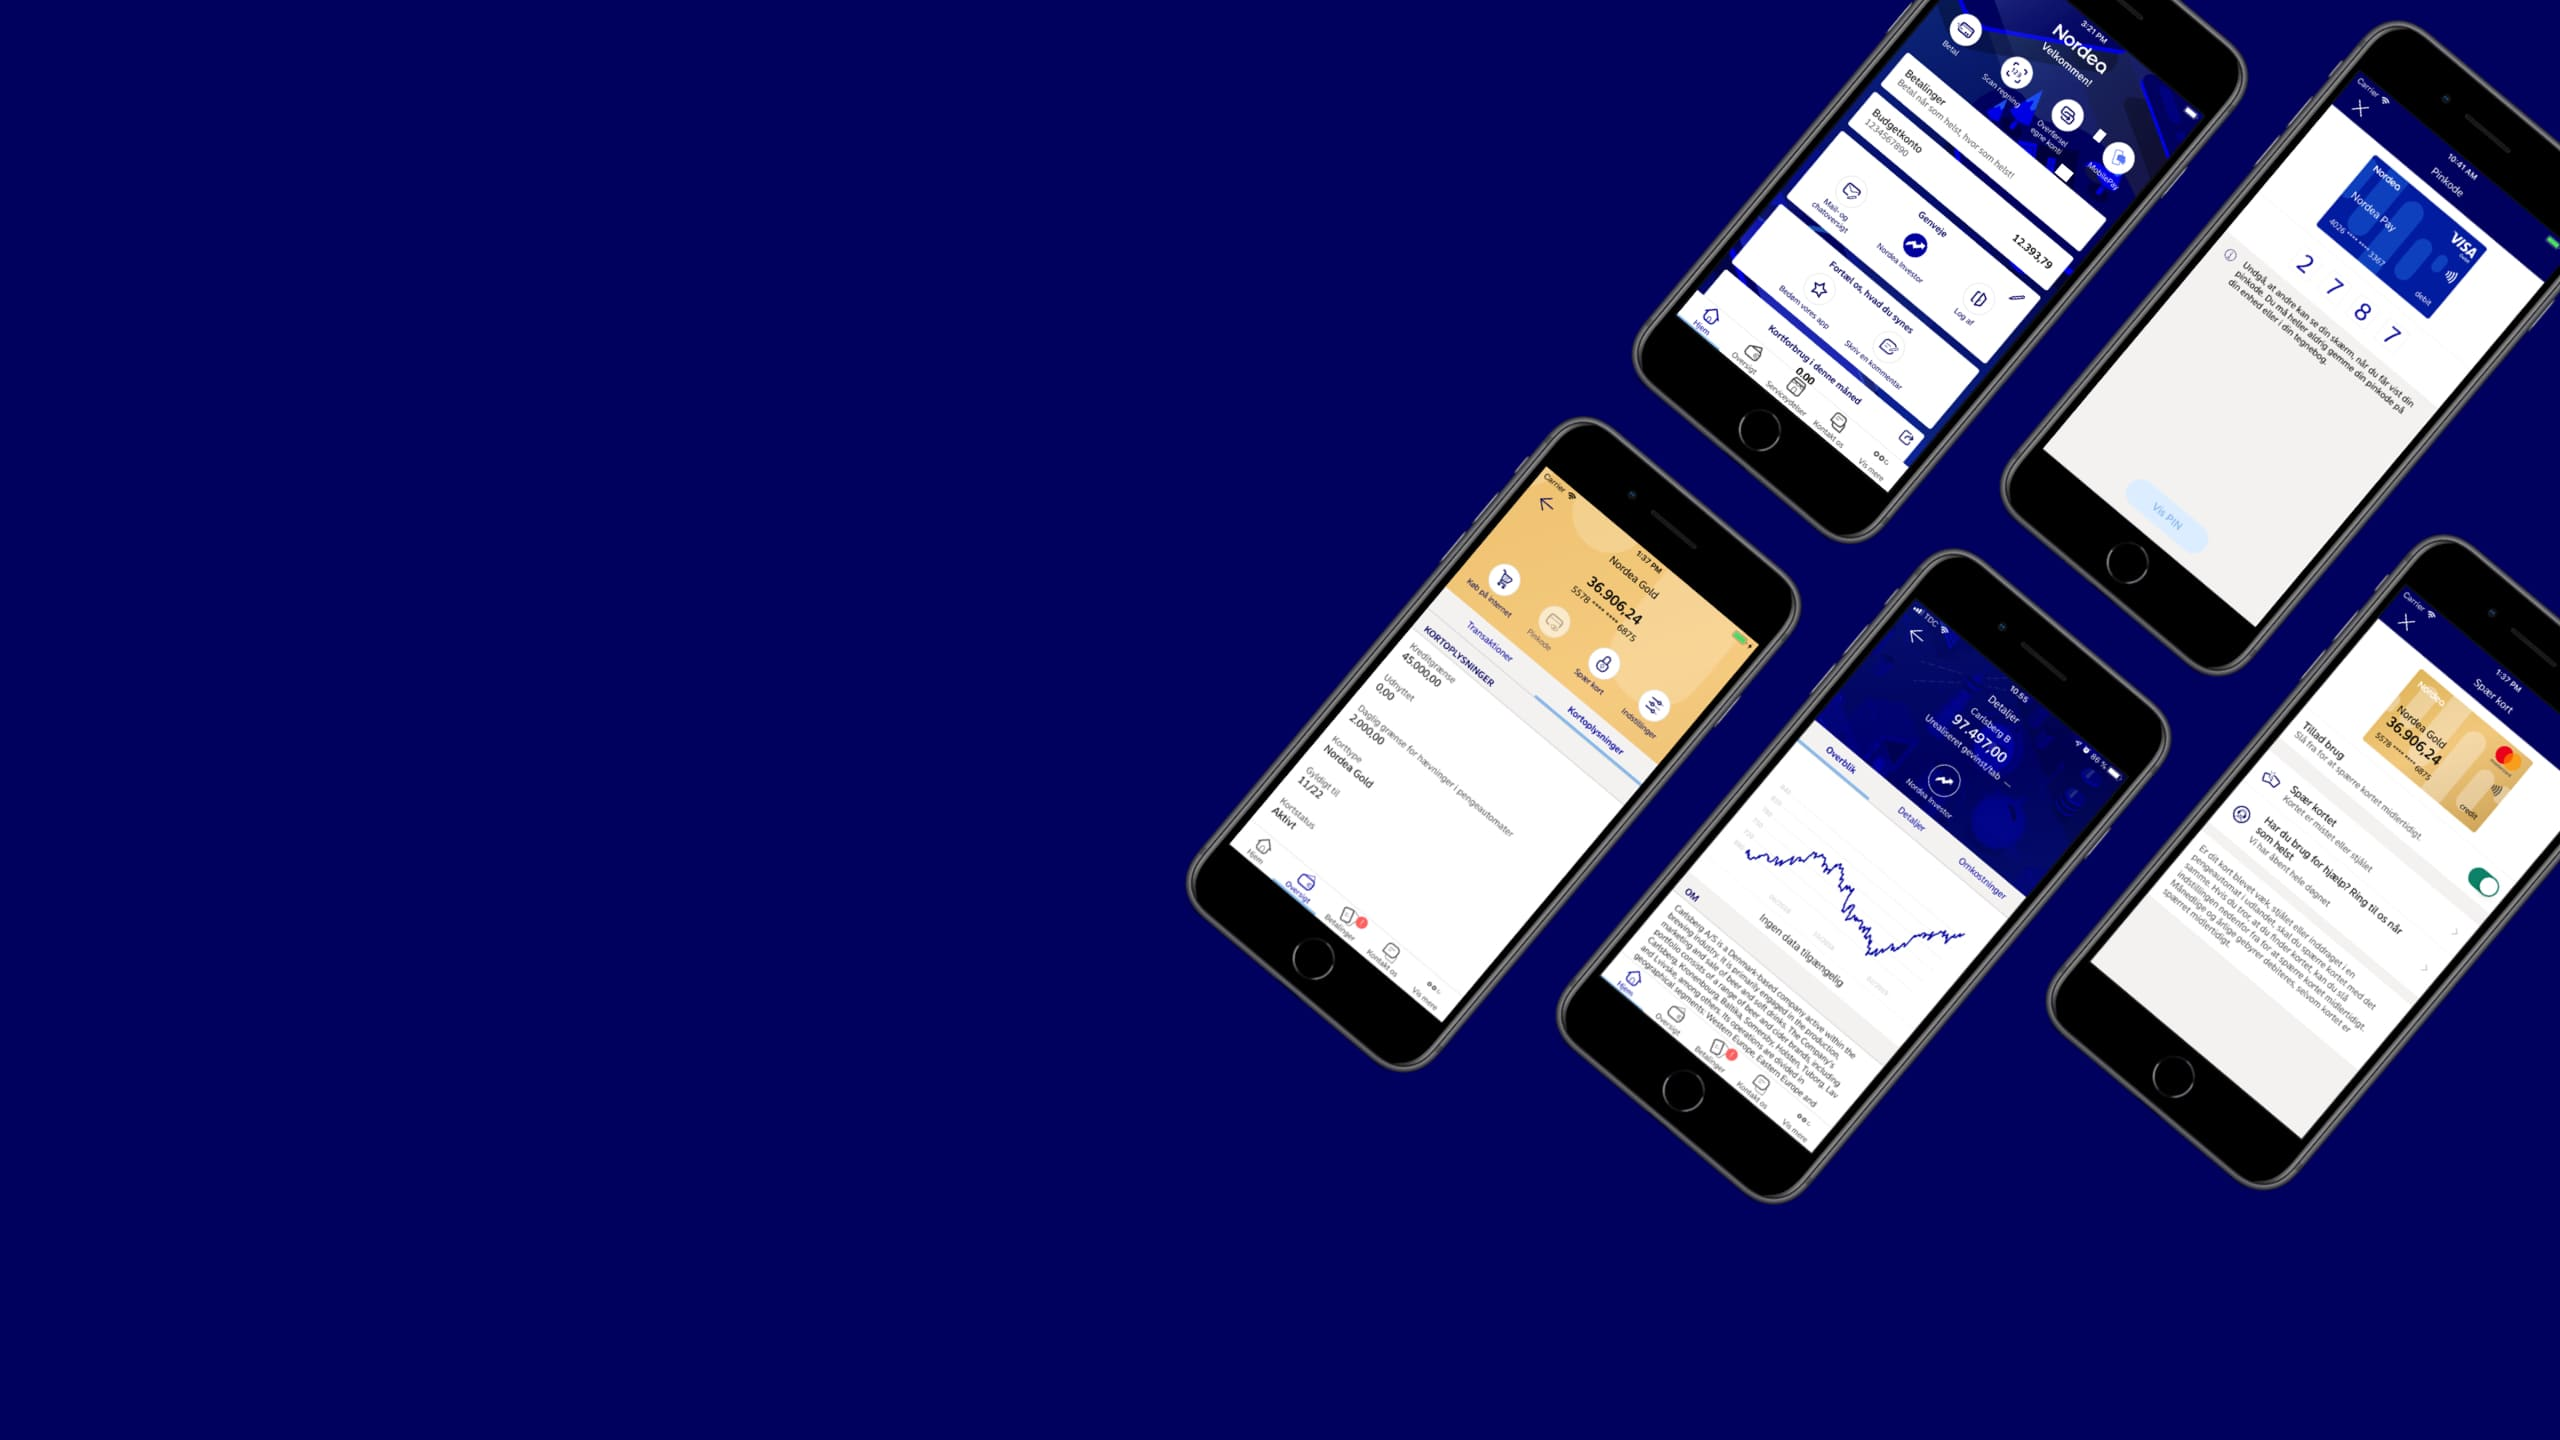 Din Mobilbank Har Faet Nyt Design Nordea Dk